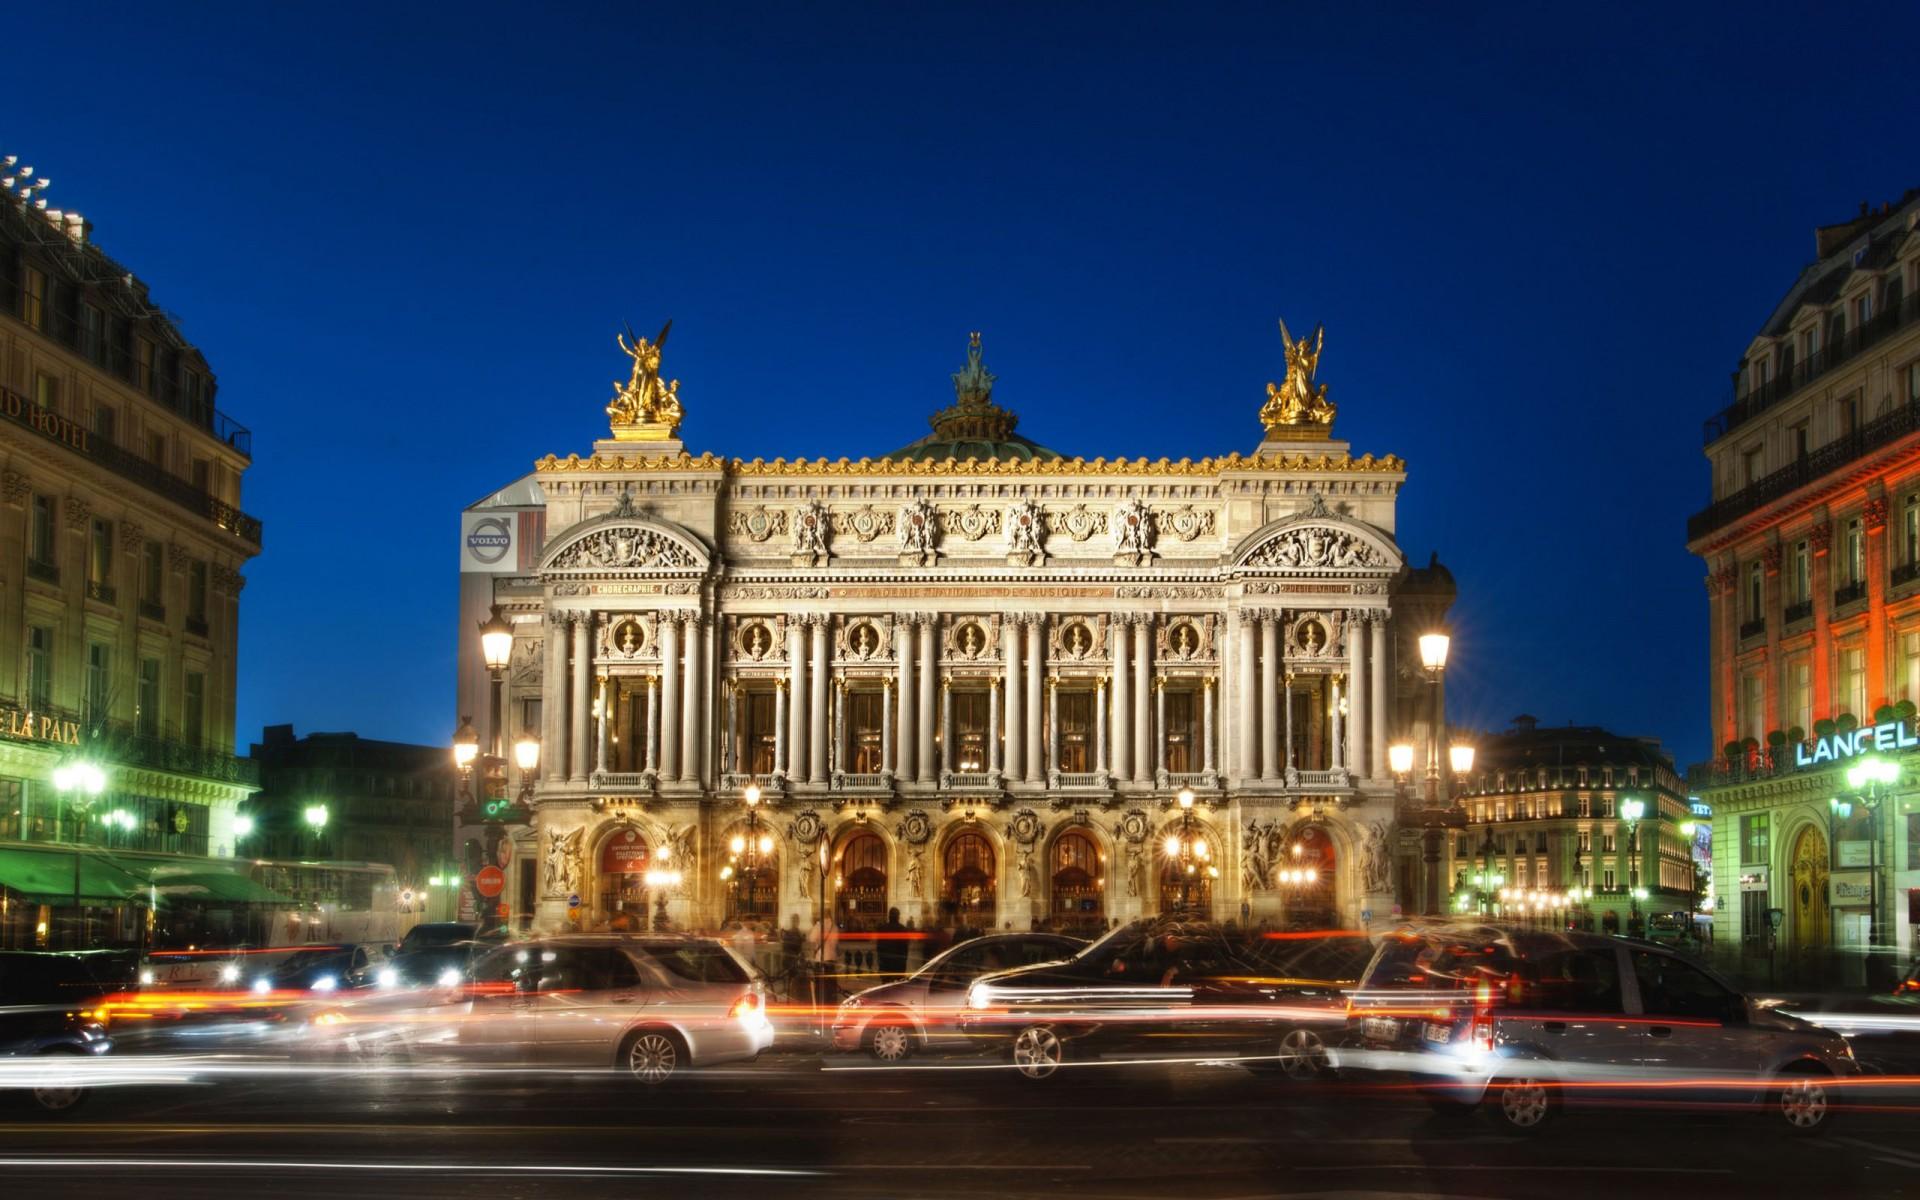 paris-opera-night-france-hd-widescreen-wallpaper